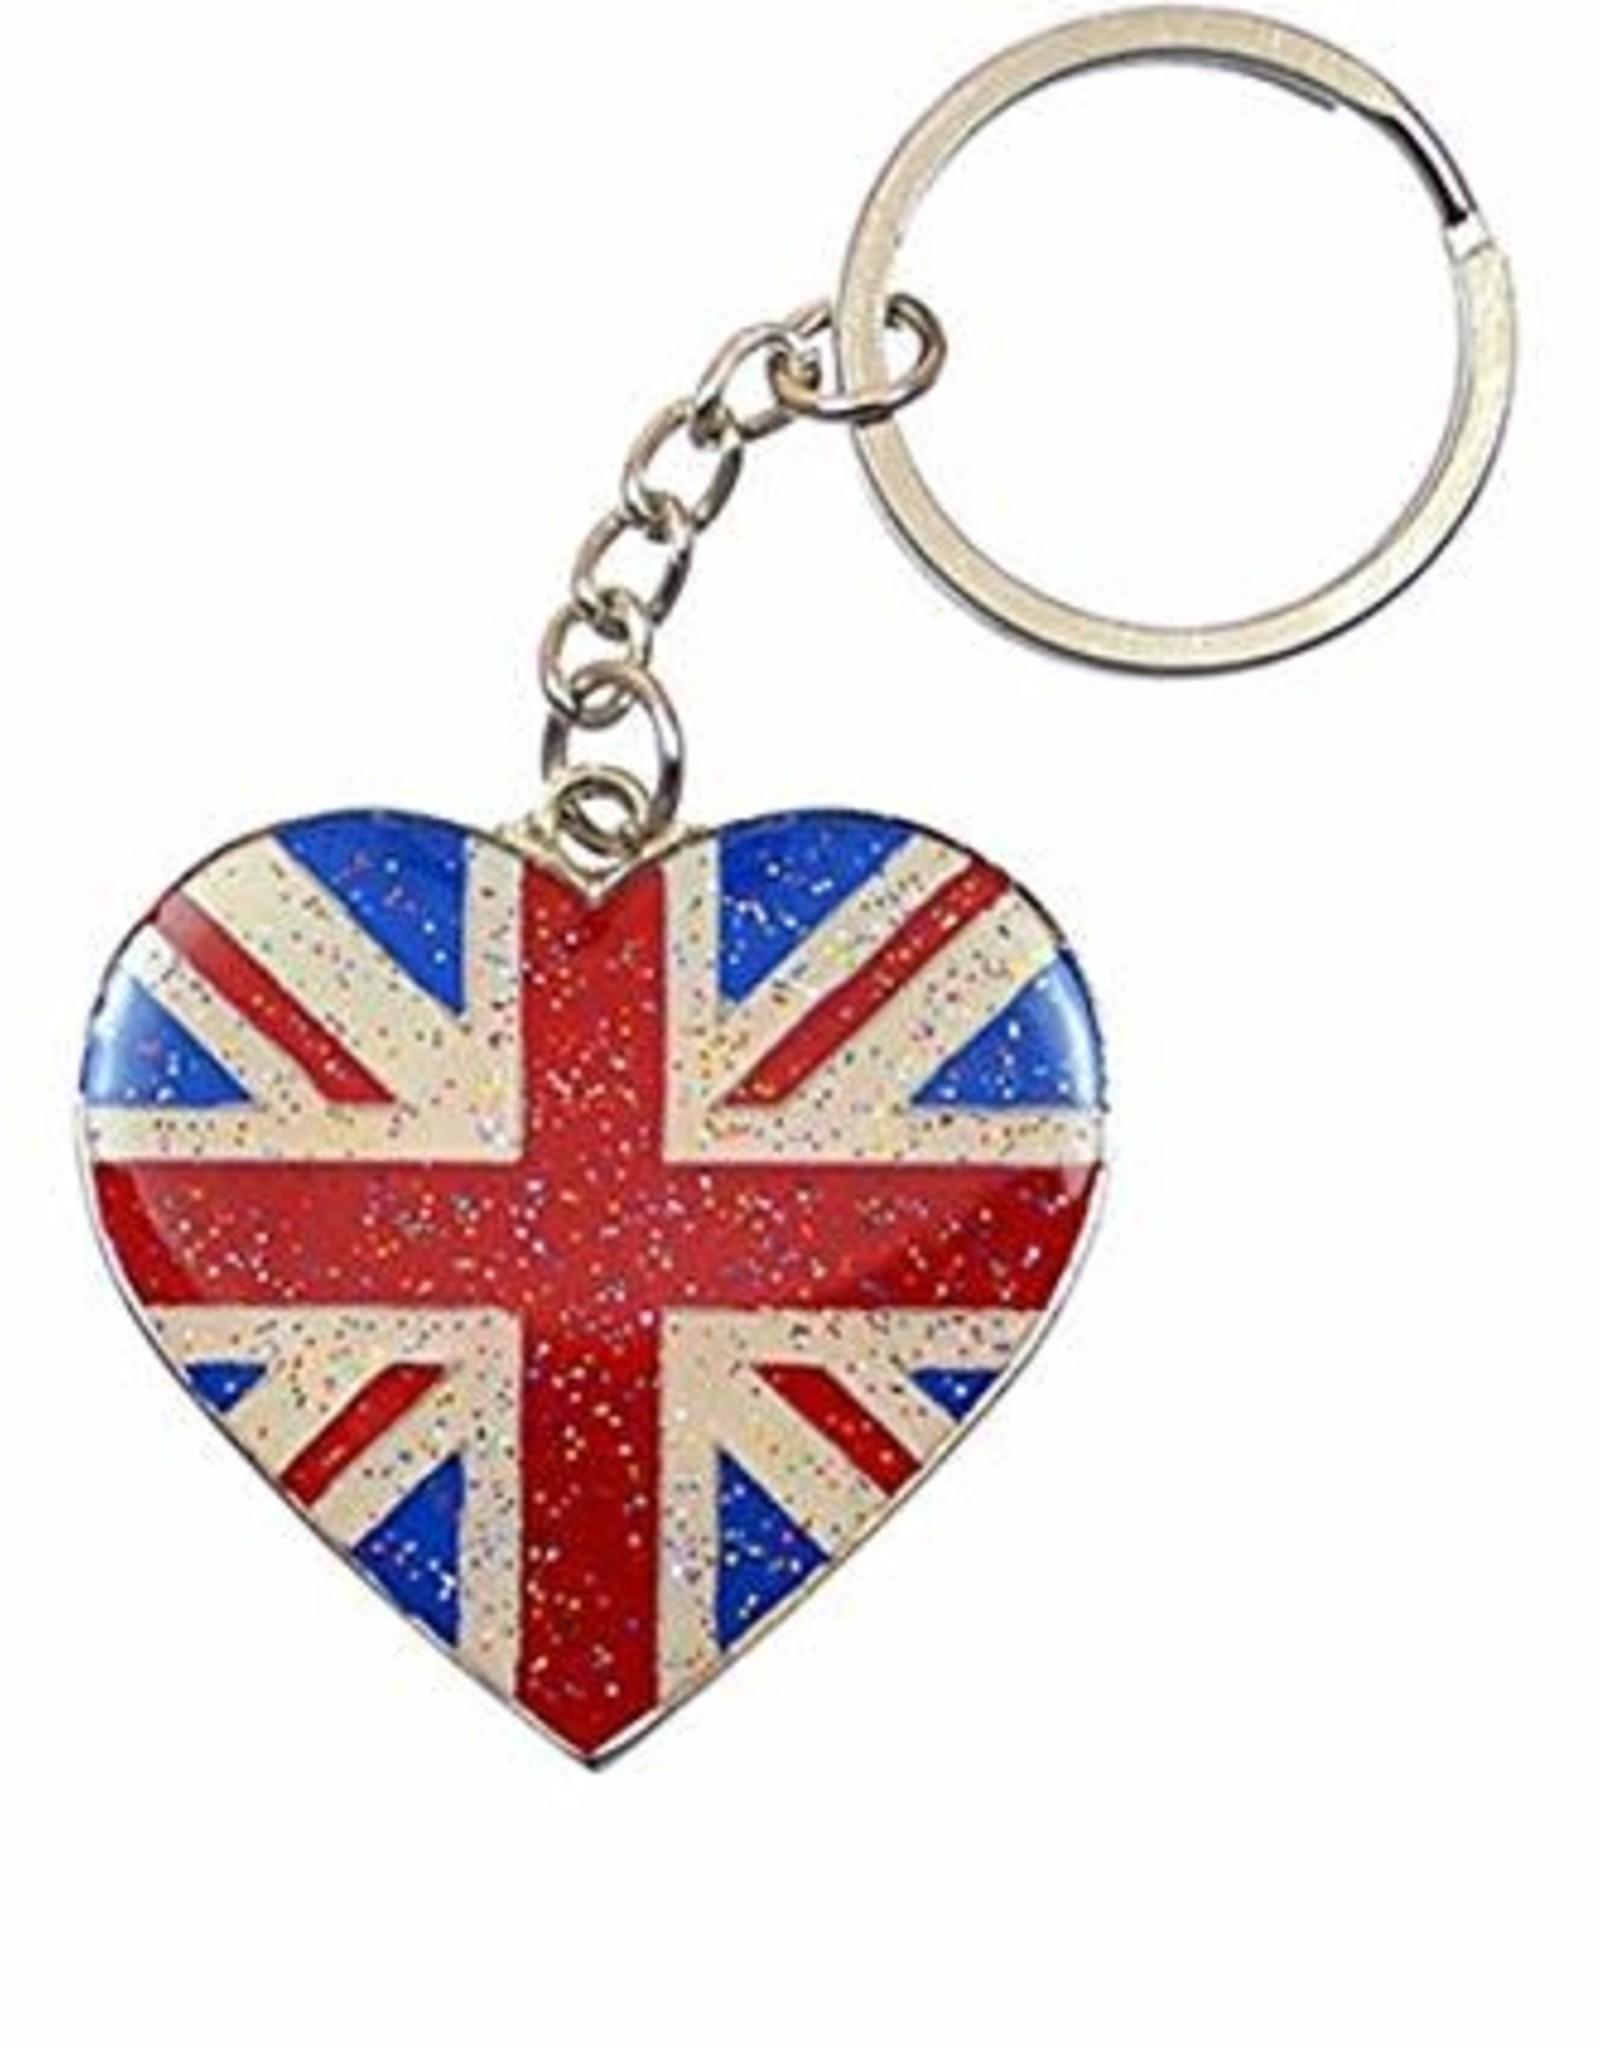 Elgate Union Jack Glitter Heart Keyring